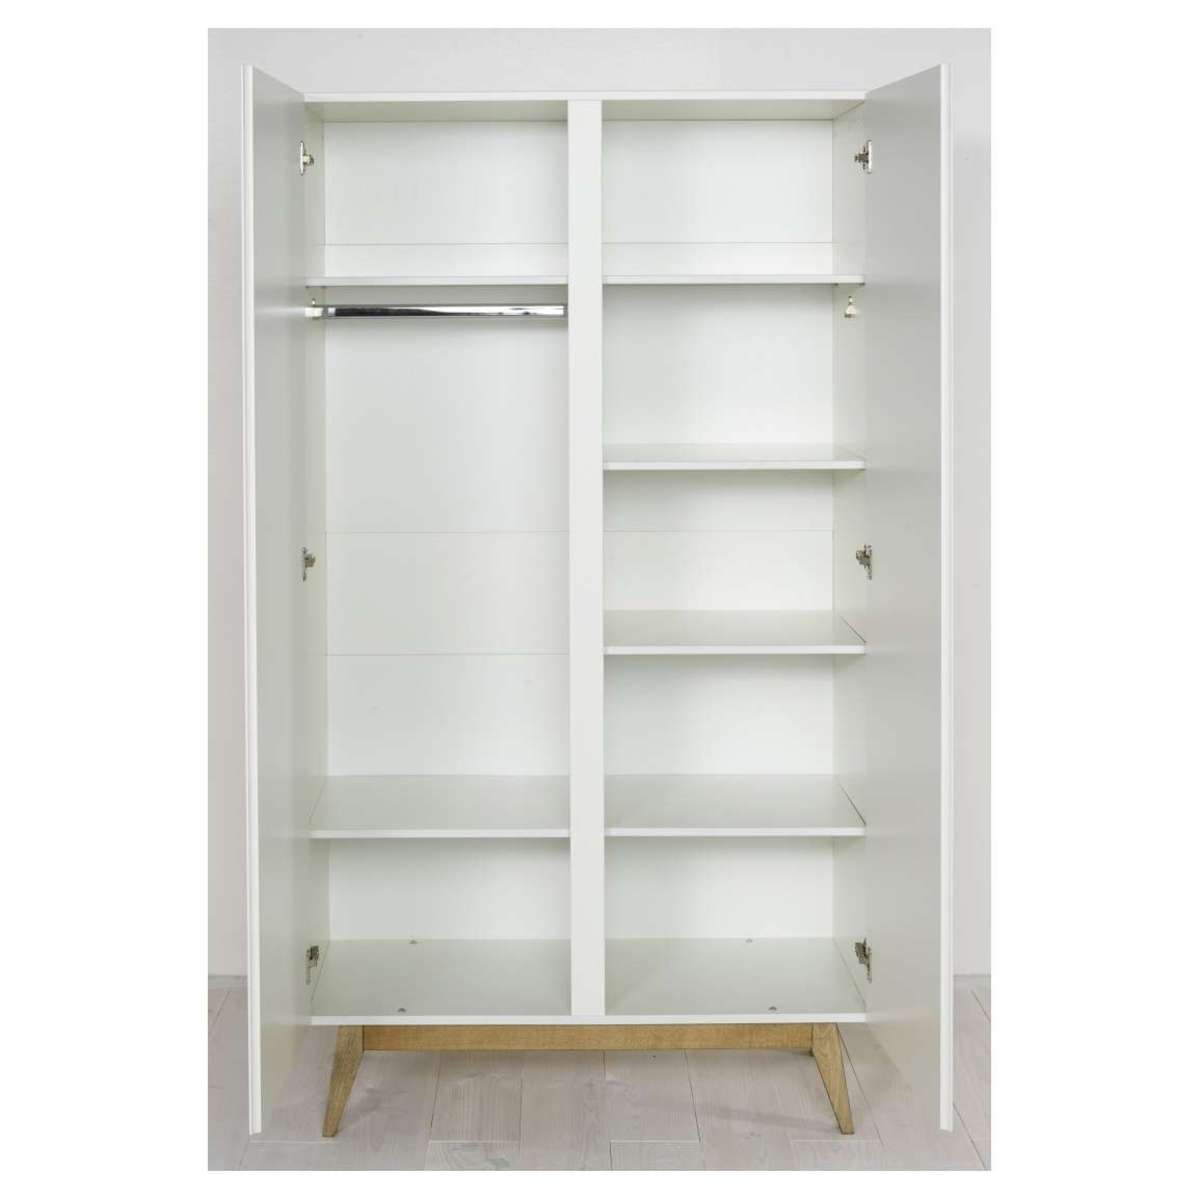 Quax armoire 2 portes trendy blanc armoire quax sur l for Chambre quax trendy